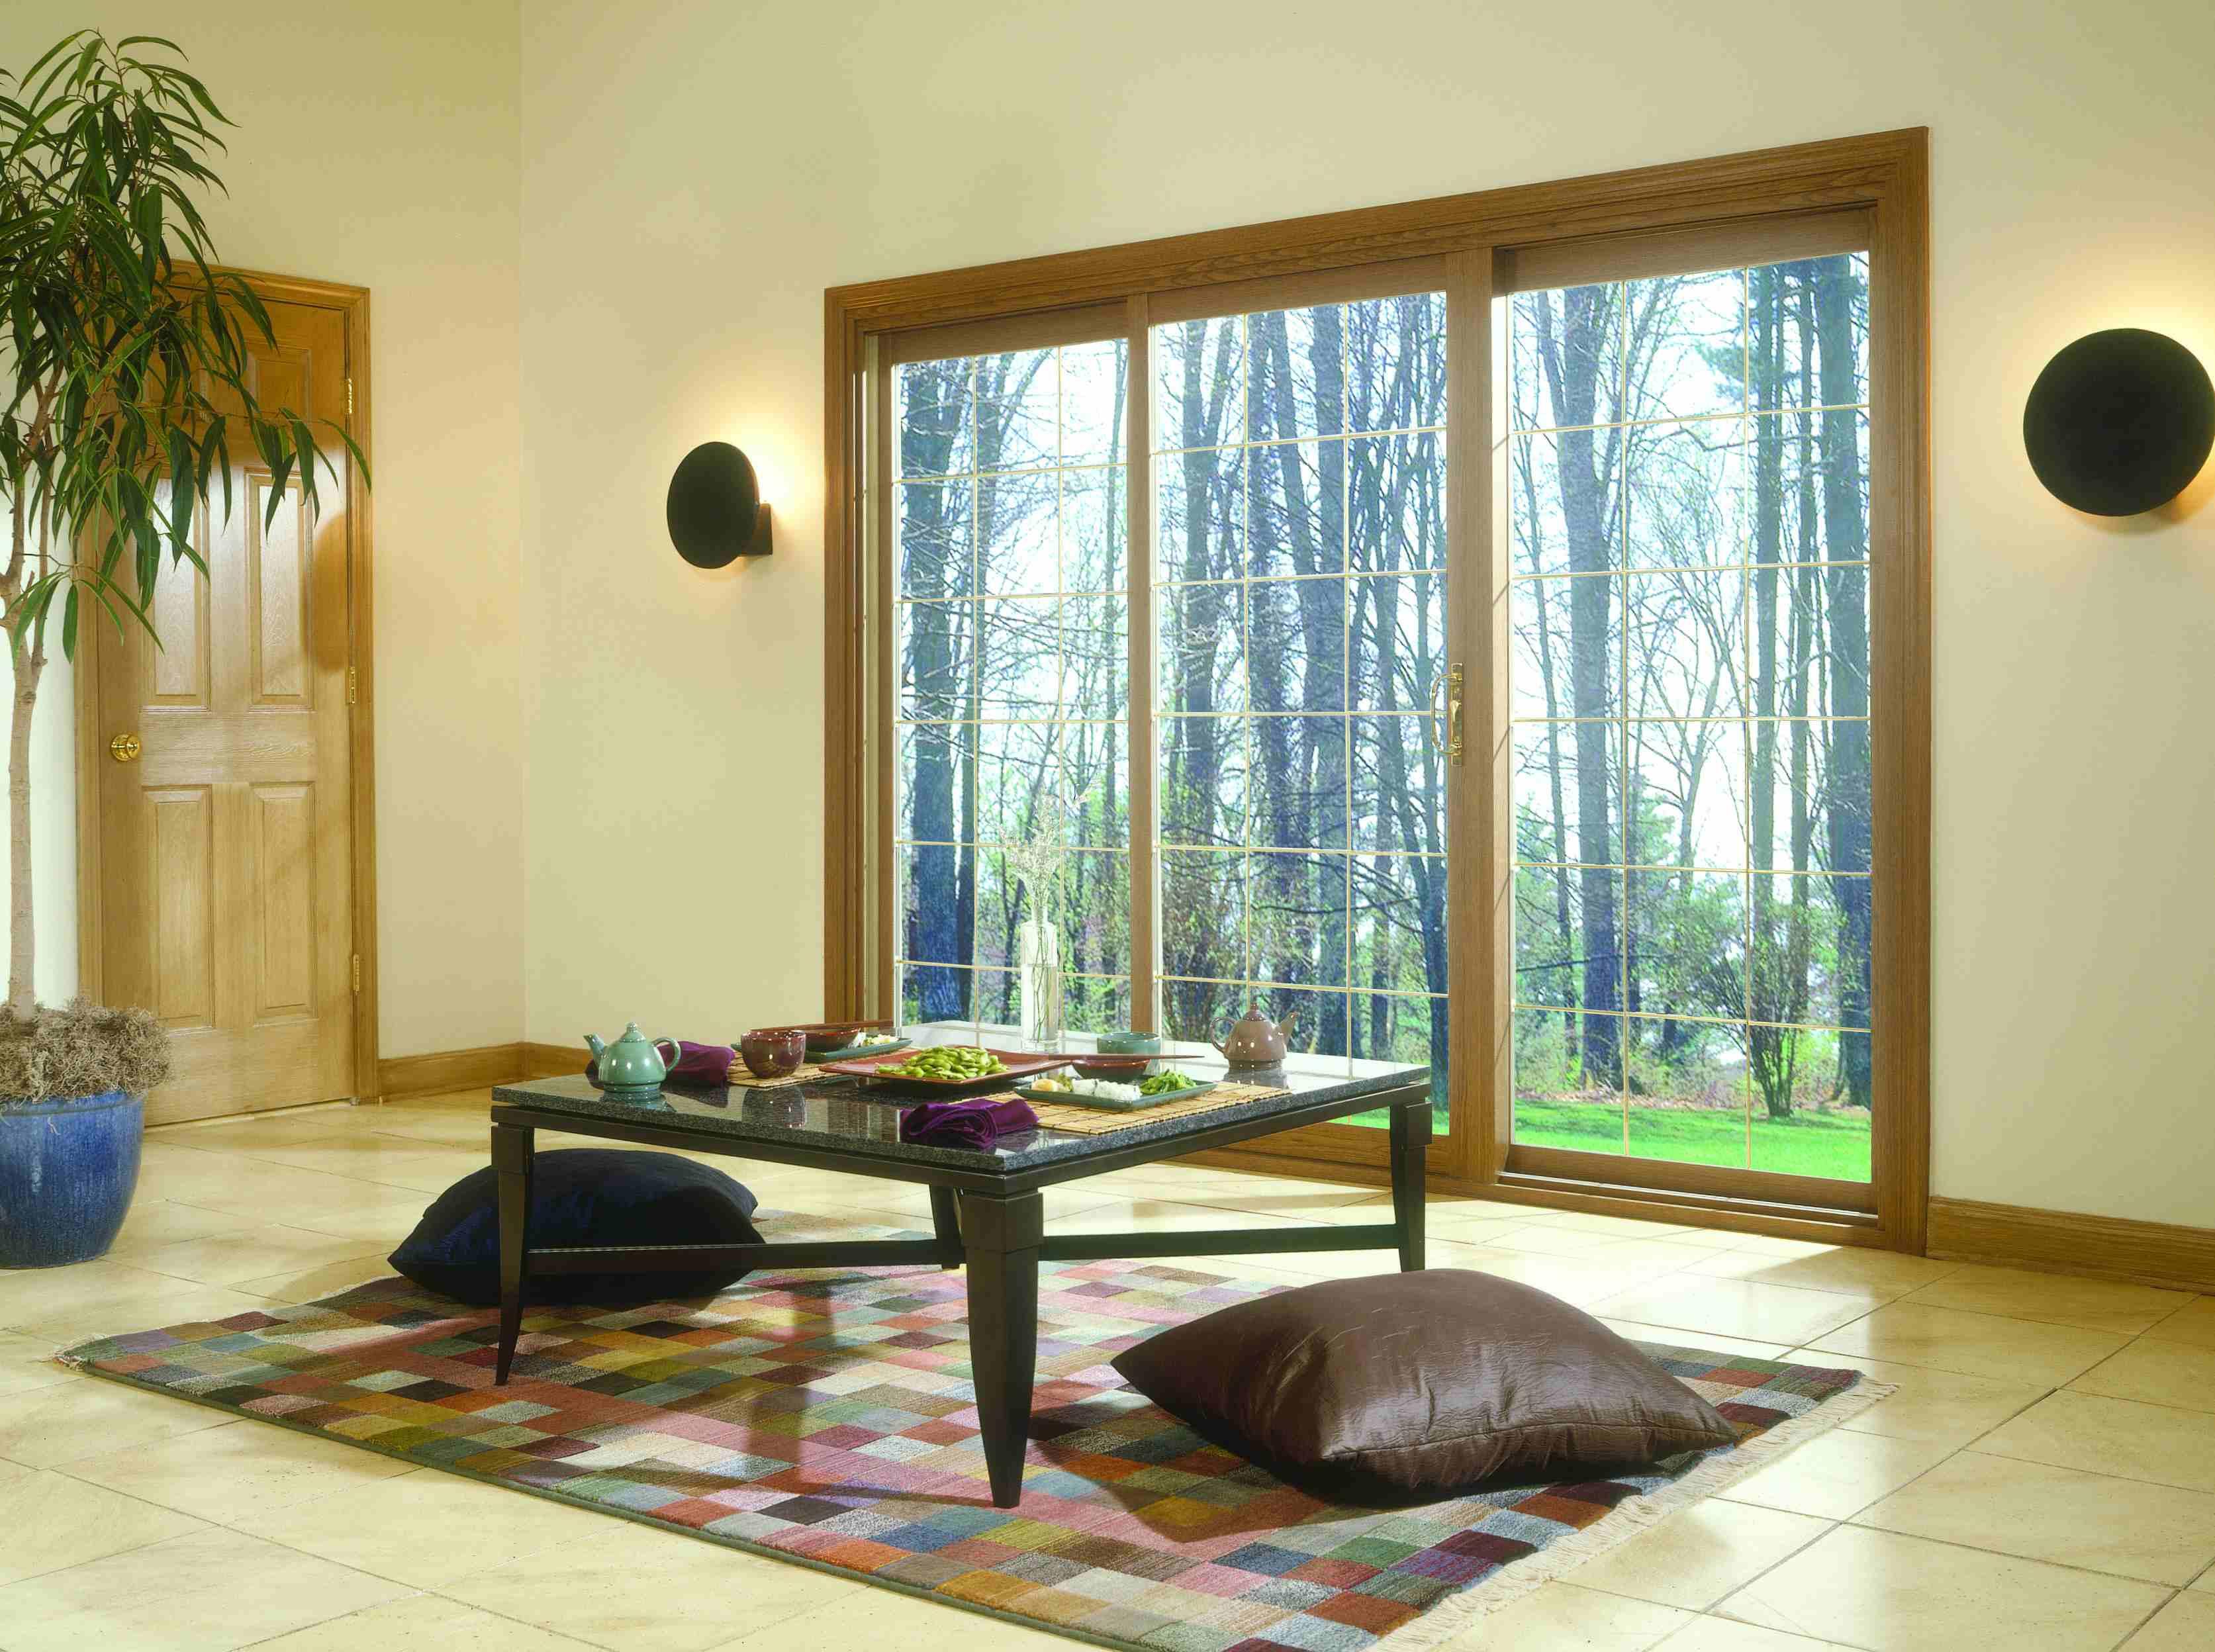 Room with panoramic patio doors minimalistic room with panoramic patio doors planetlyrics Gallery